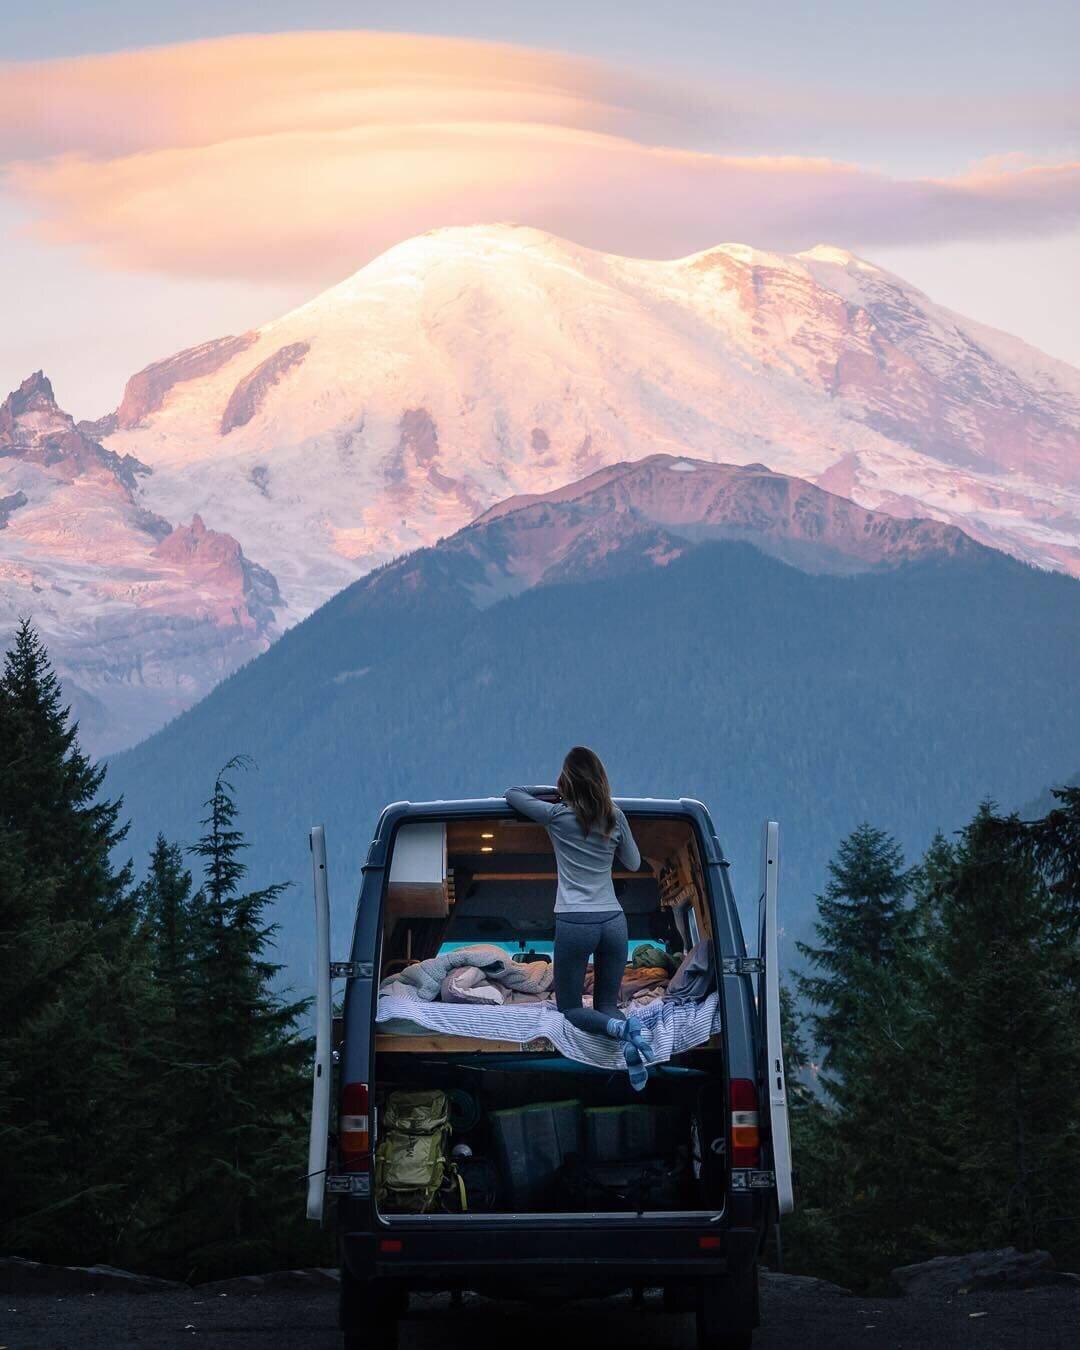 Enjoying views of Mount Rainier at sunrise.